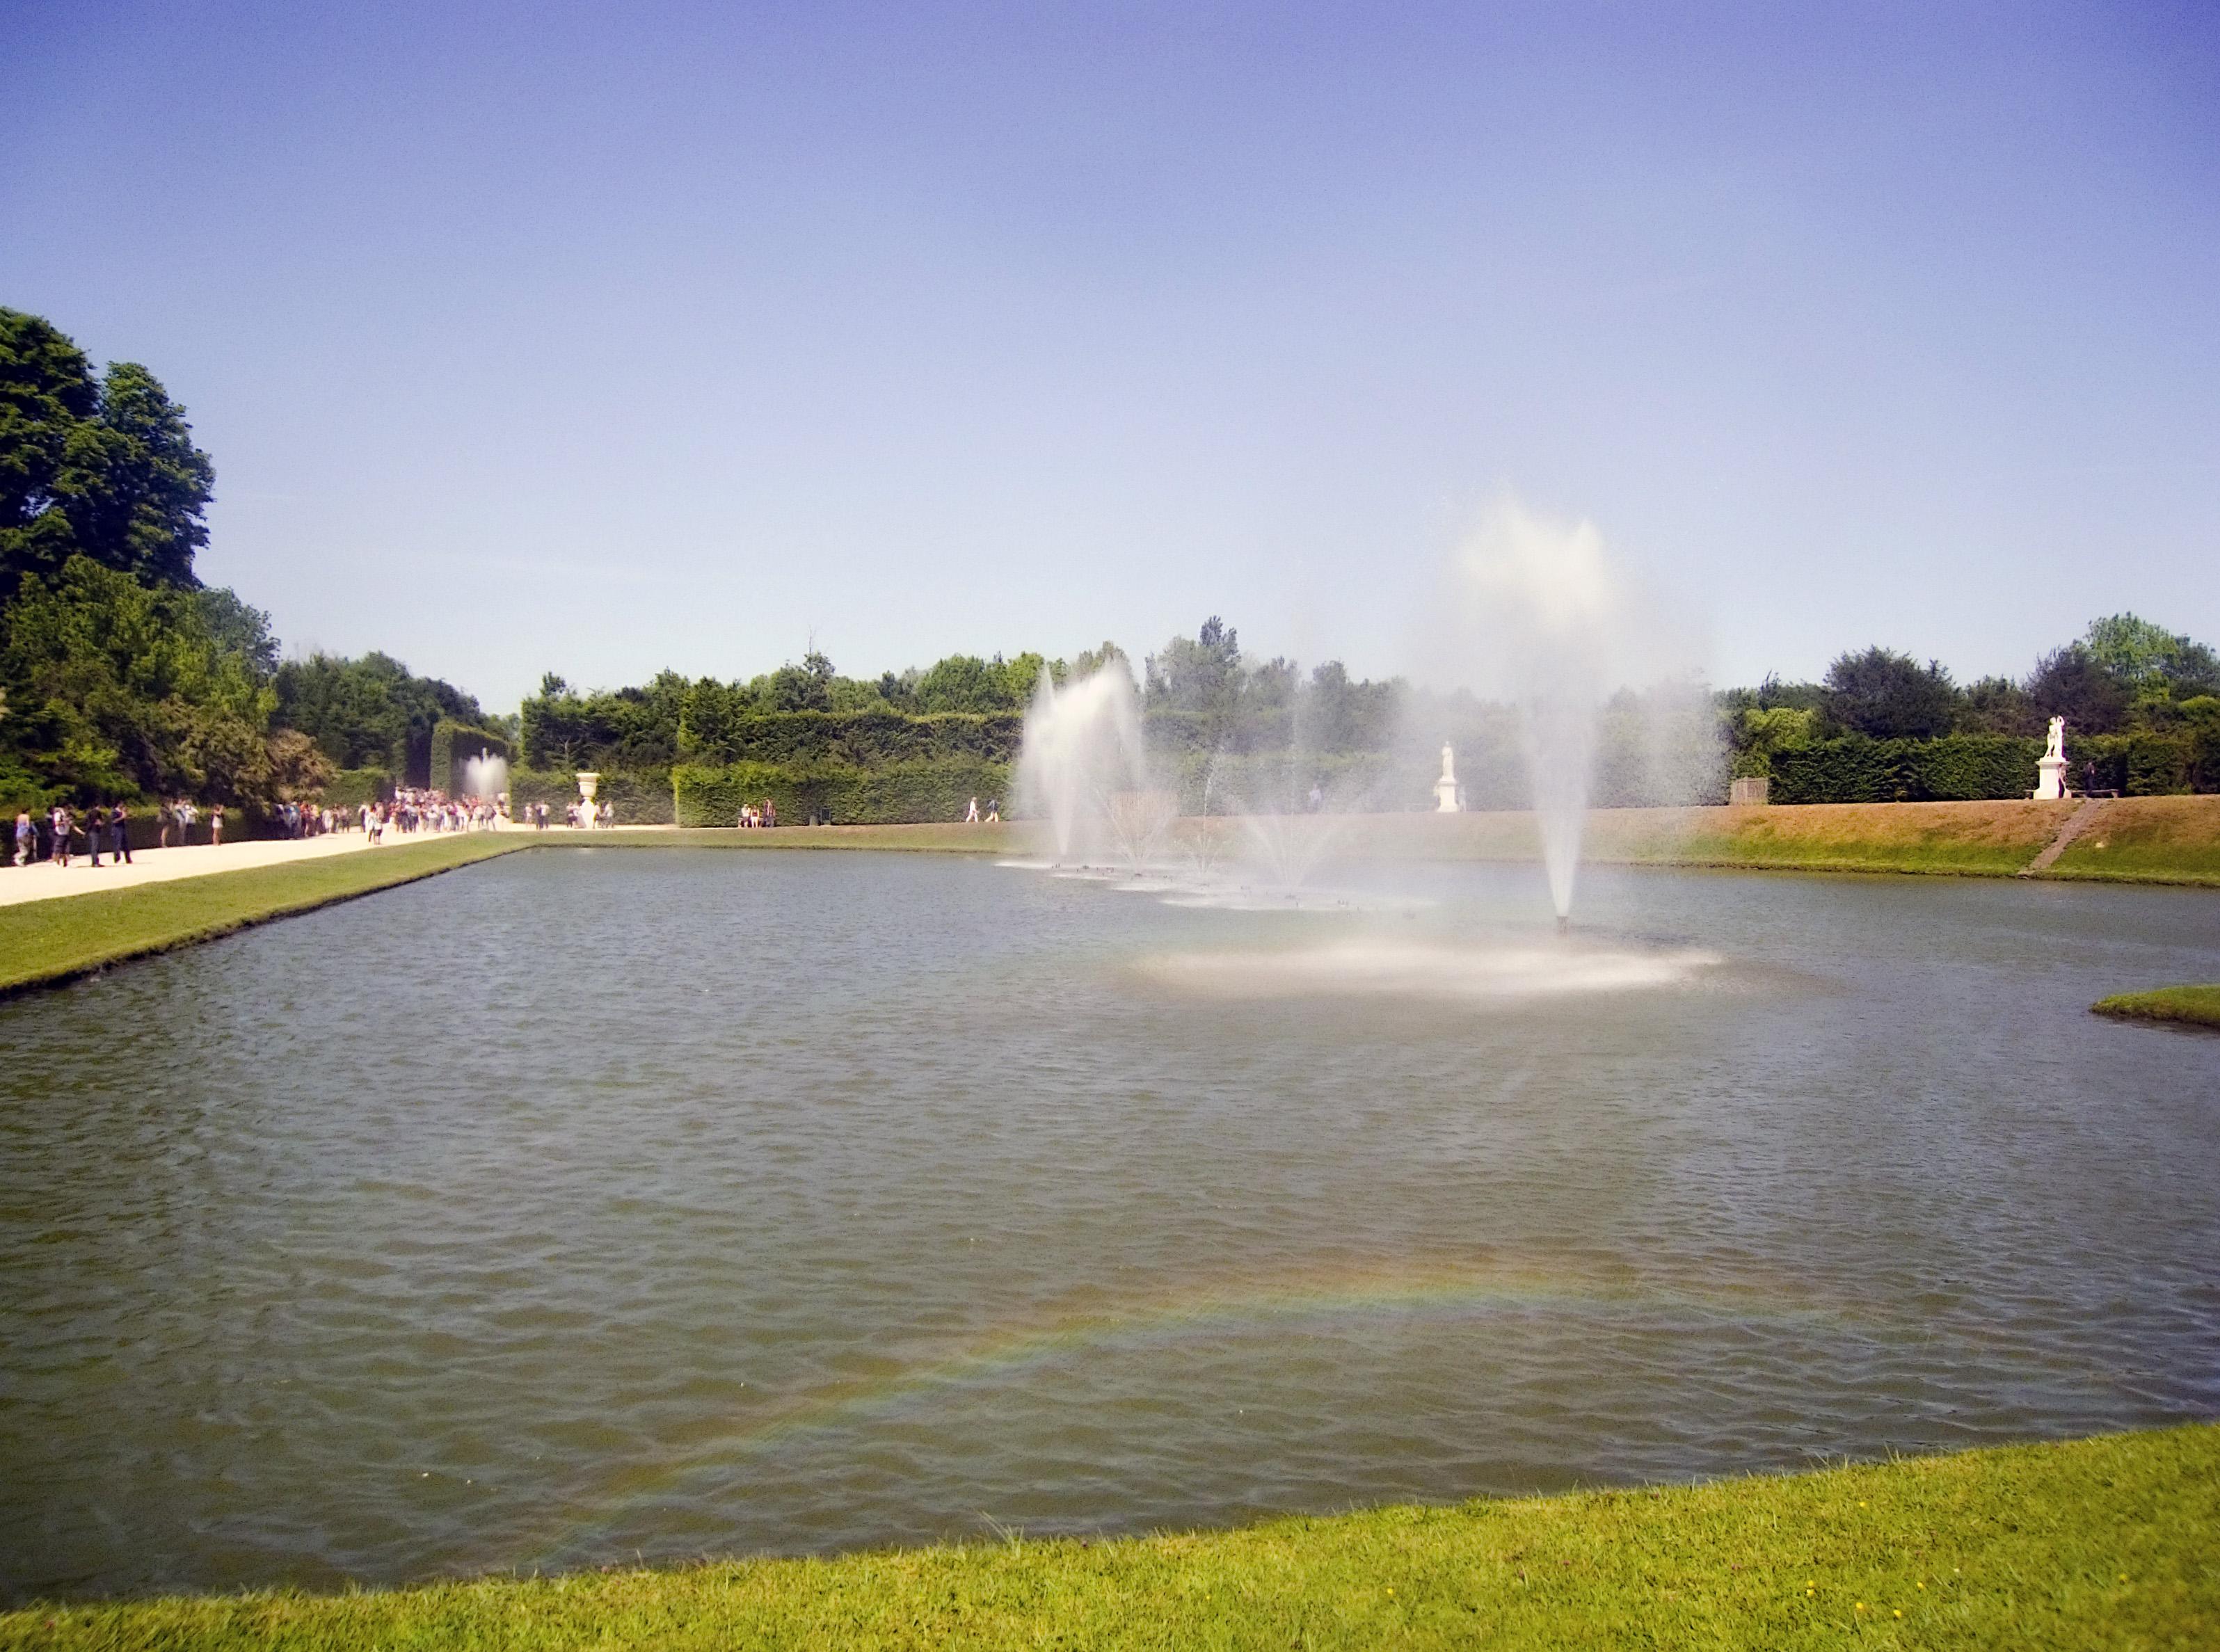 Bassin du miroir jardins de versailles vue loign e des for Bassin miroir